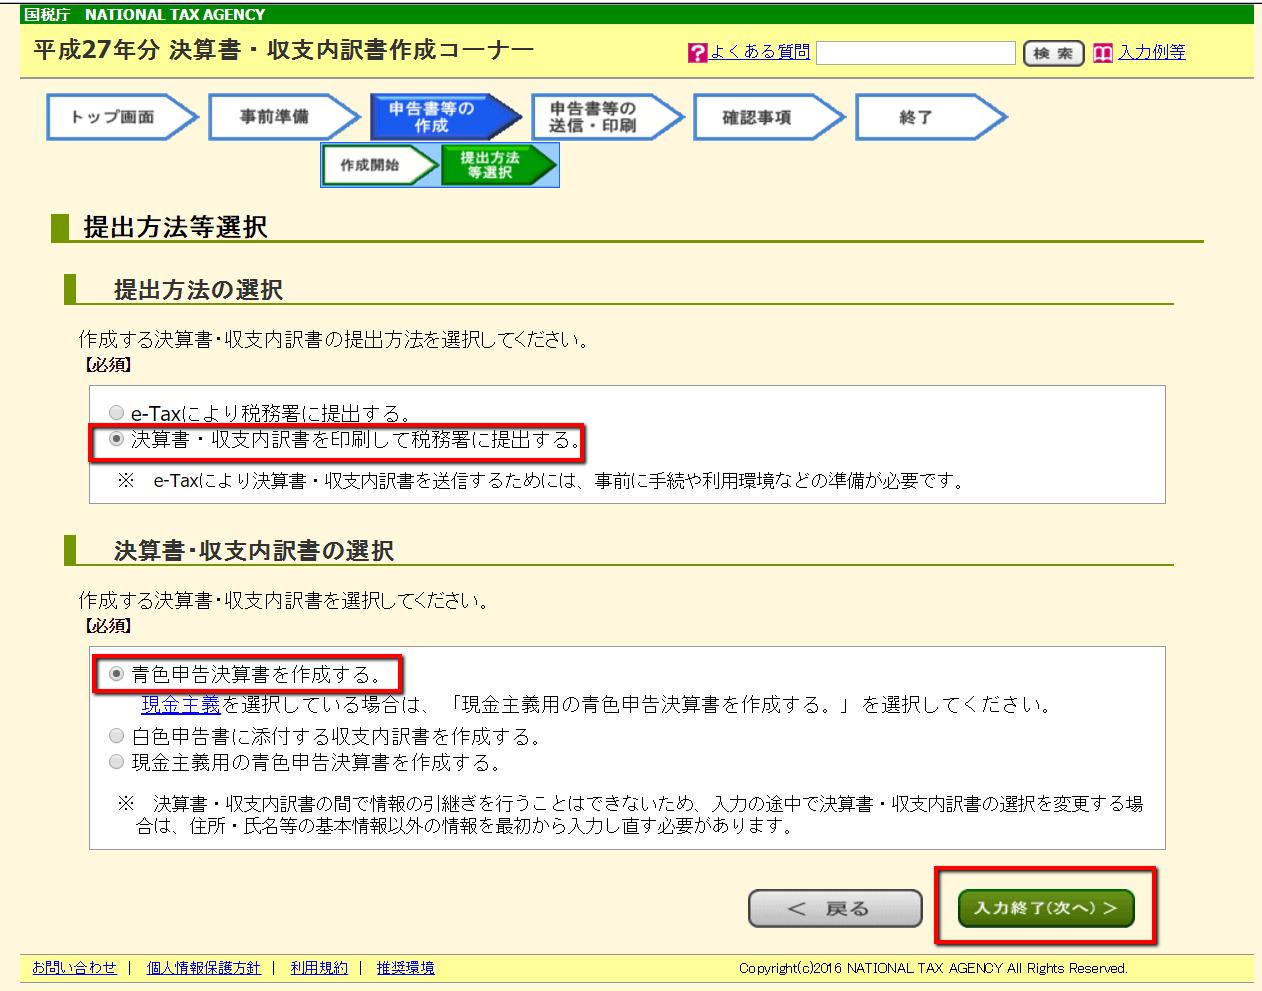 2016-02-29_0916